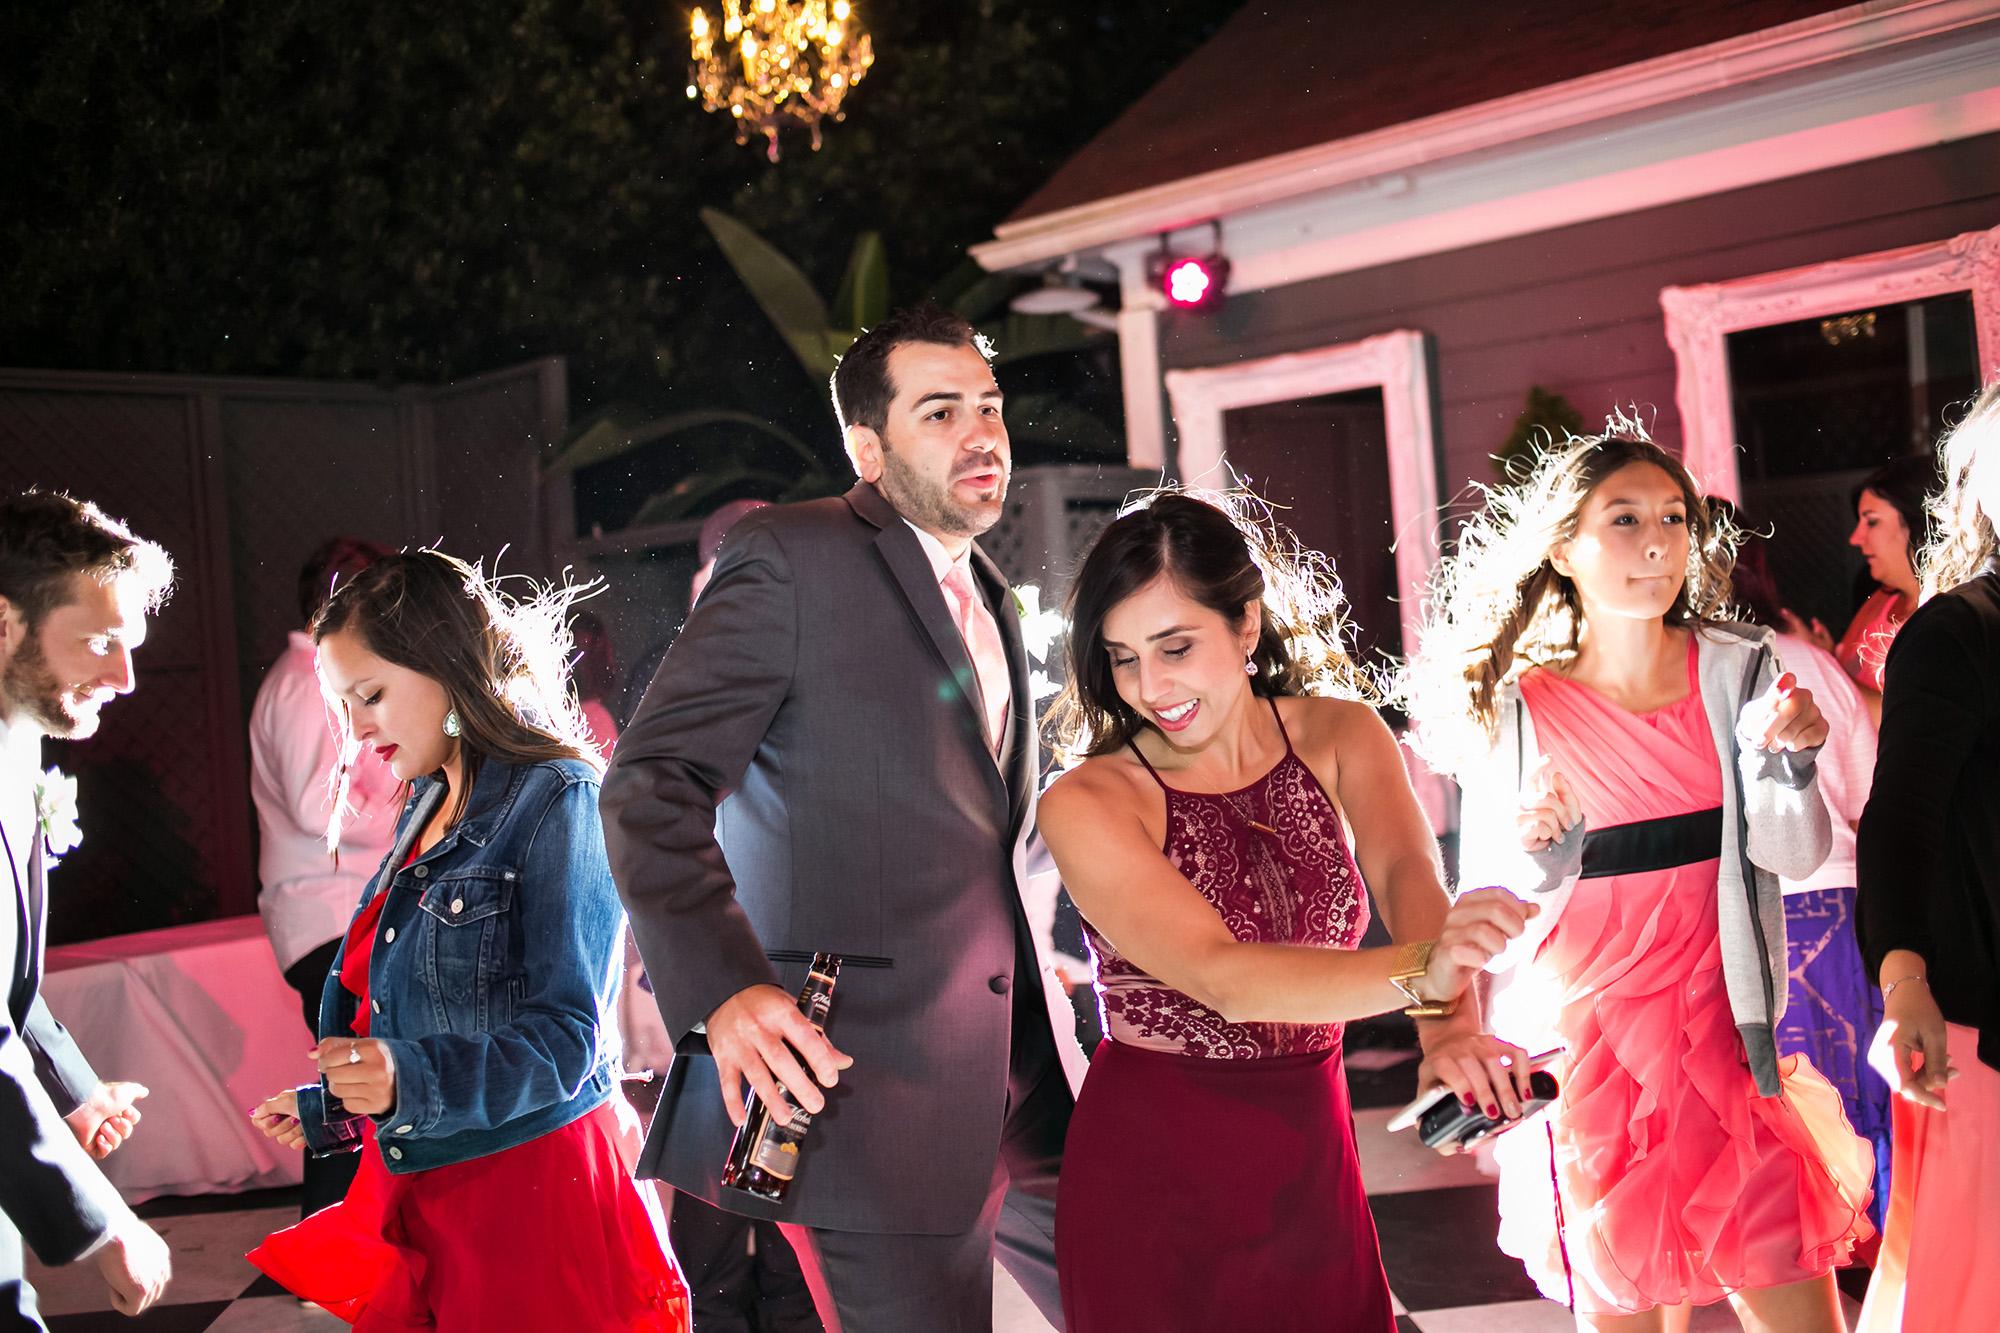 christmas-house-weddings-receptions-carrie-vines-144.jpg